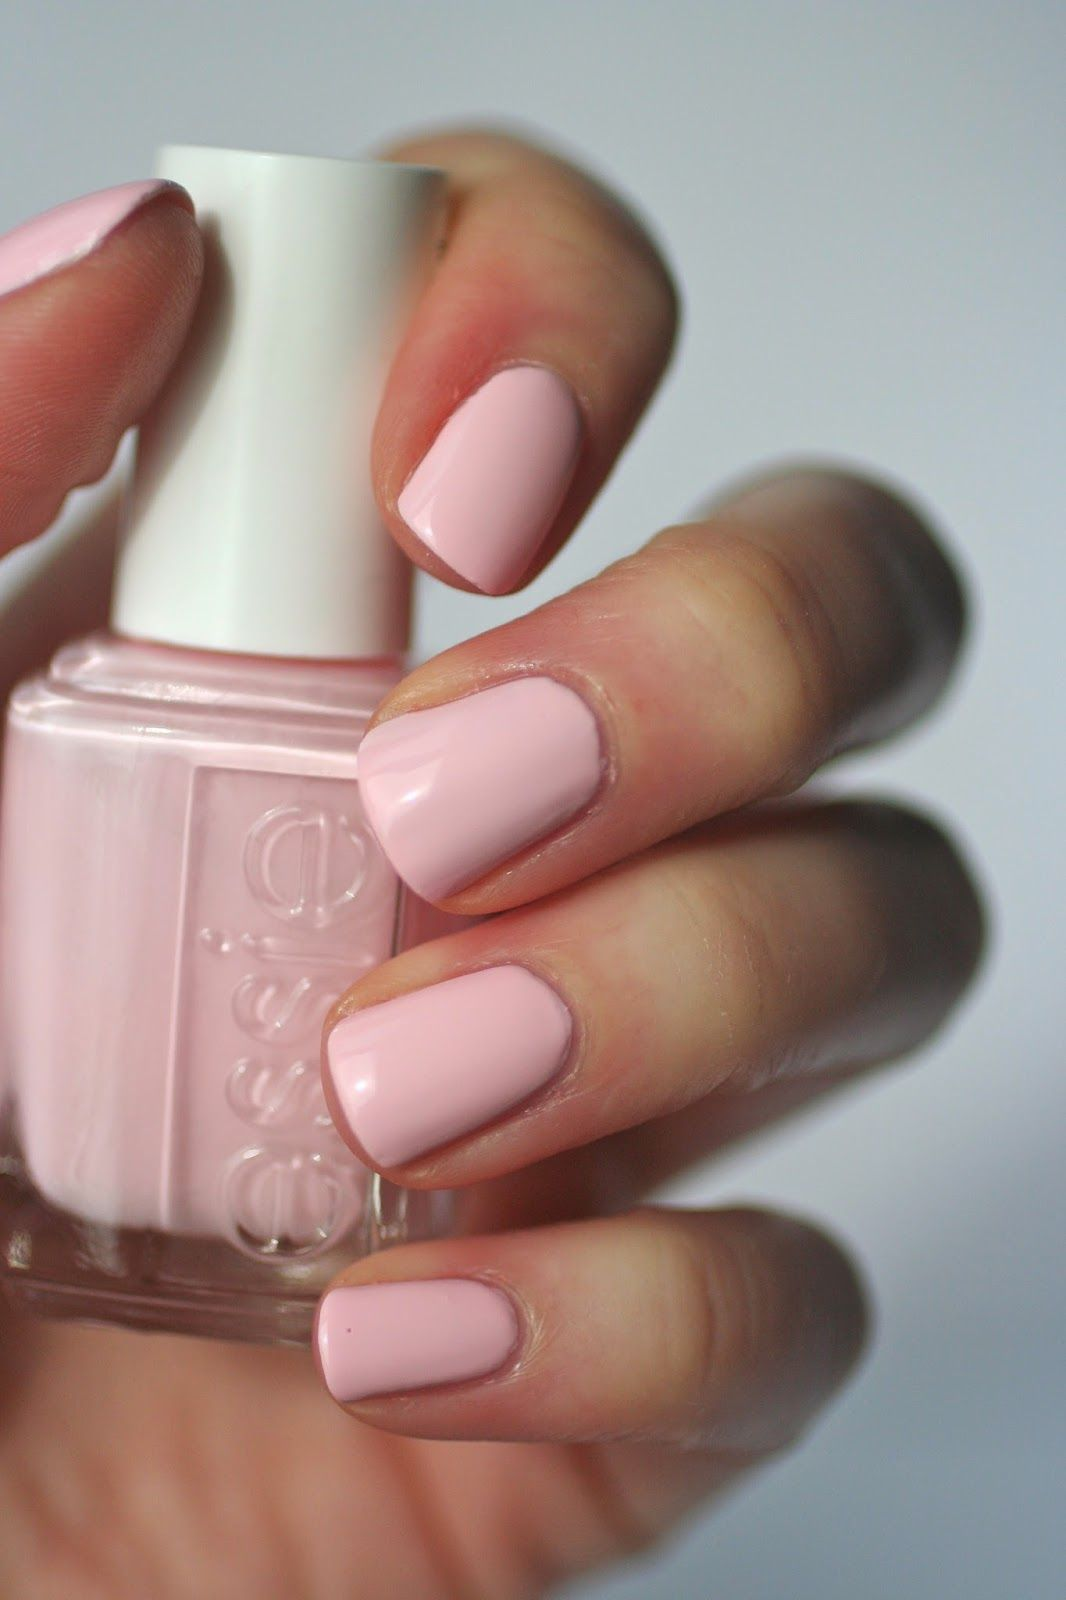 Essie Fiji www.essieenvy.com | Nails | Pinterest | Pale pink, Nail ...